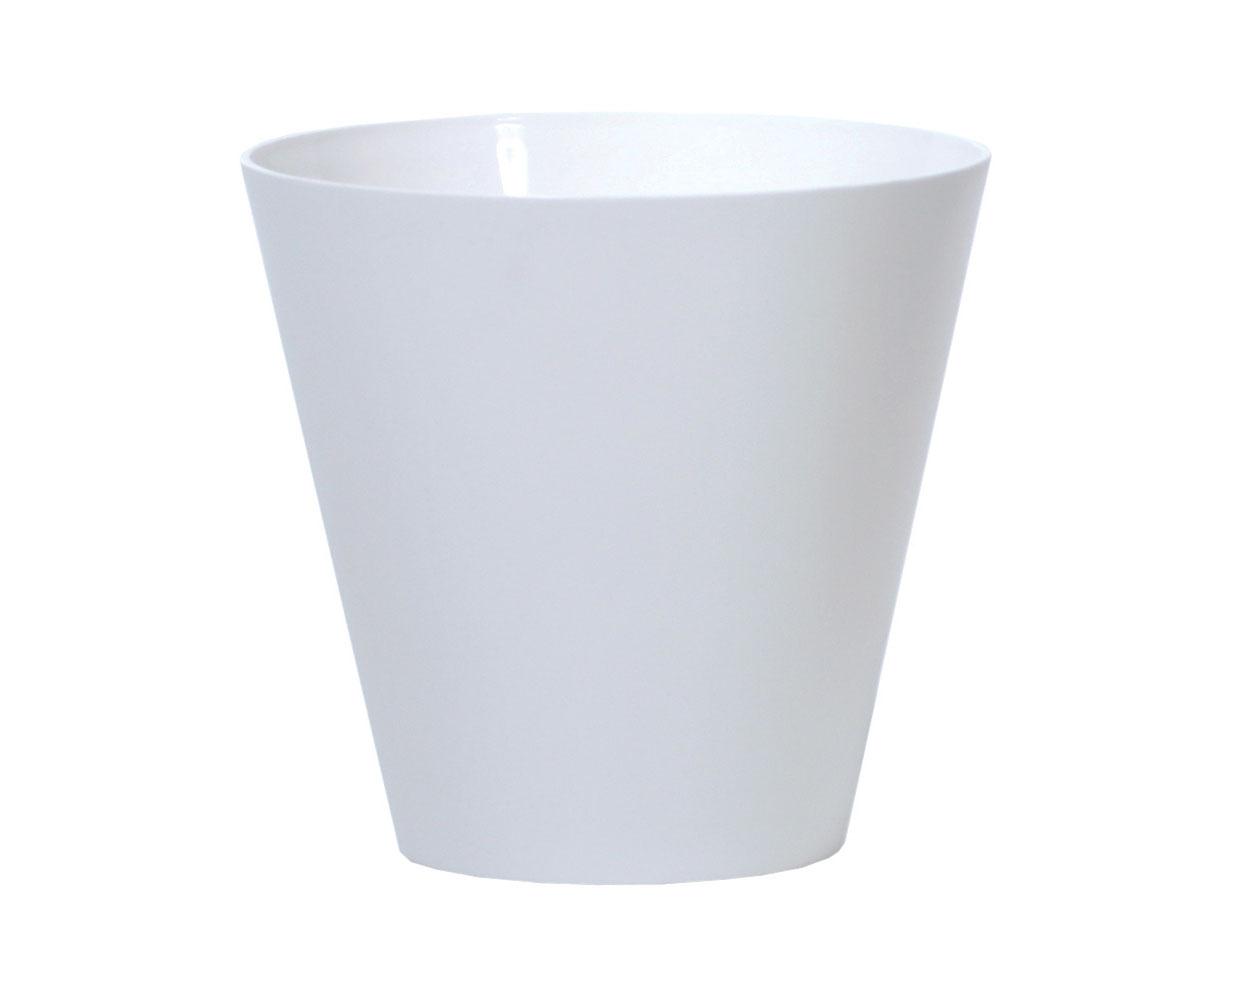 PROSPERPLAST Květináč TUBUS bílý 20,0cm